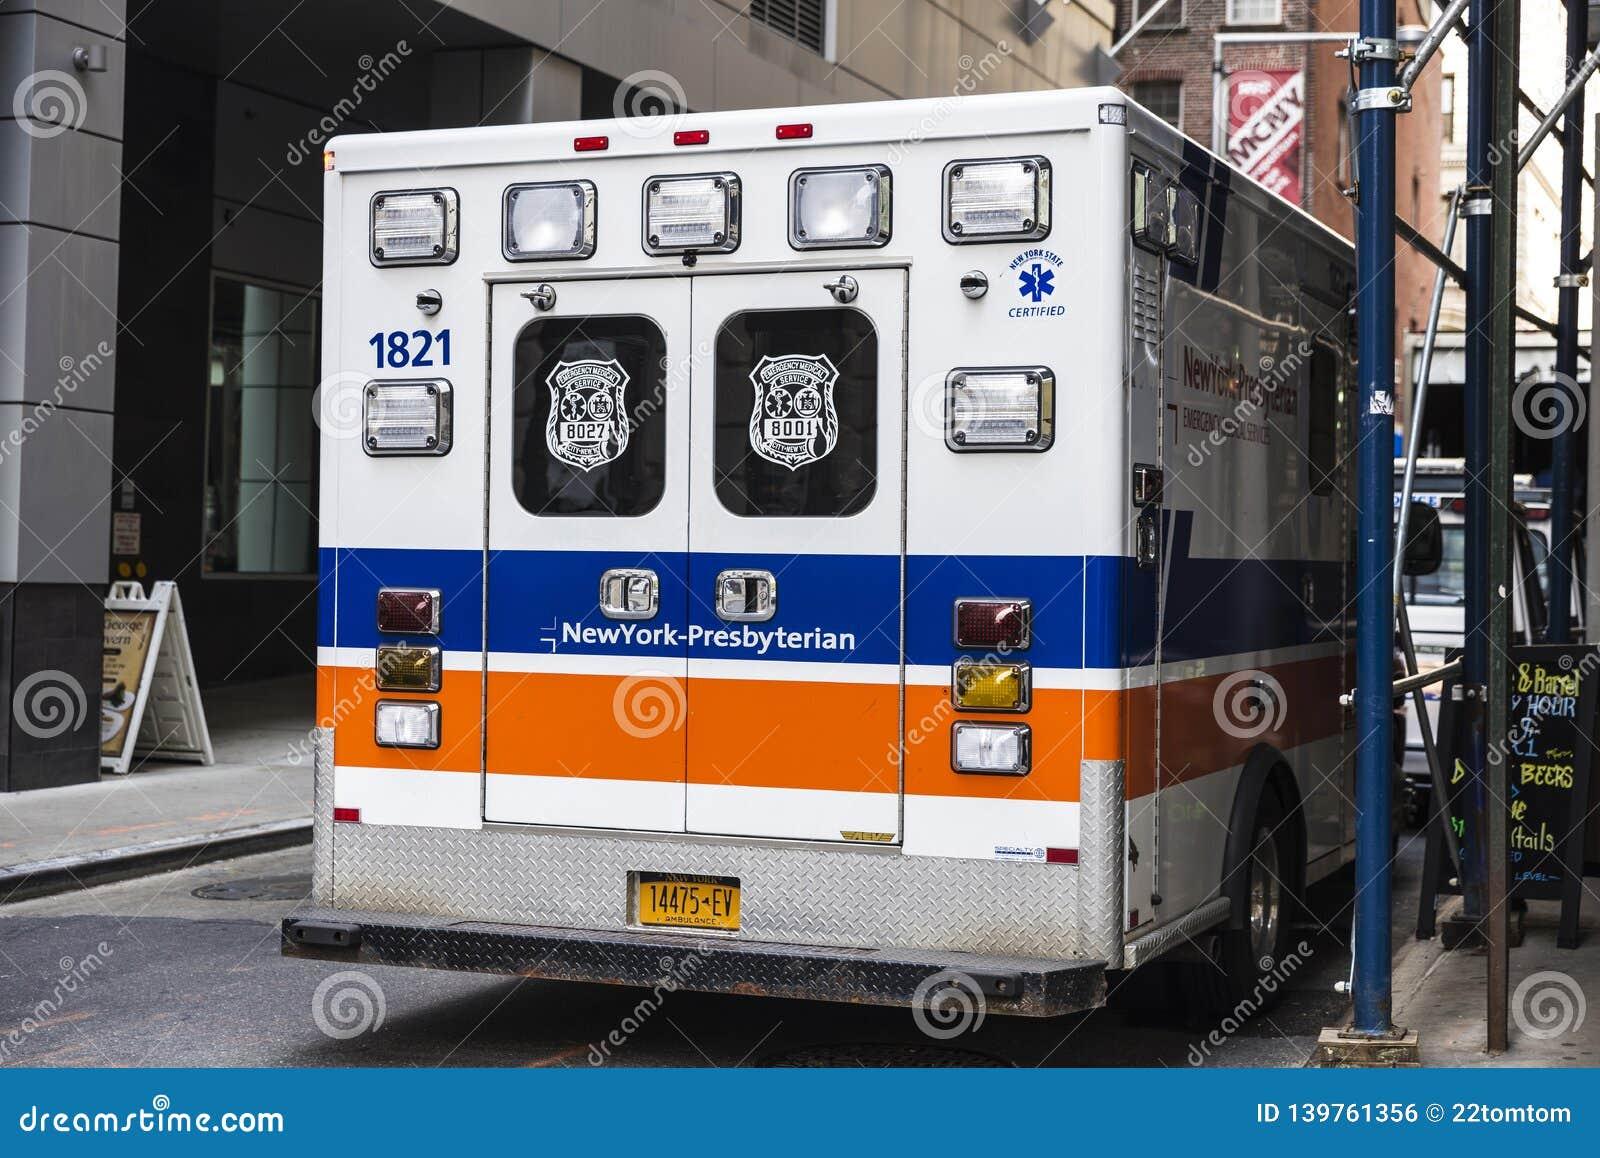 Ambulance Car Of New York Presbyterian In New York City, USA